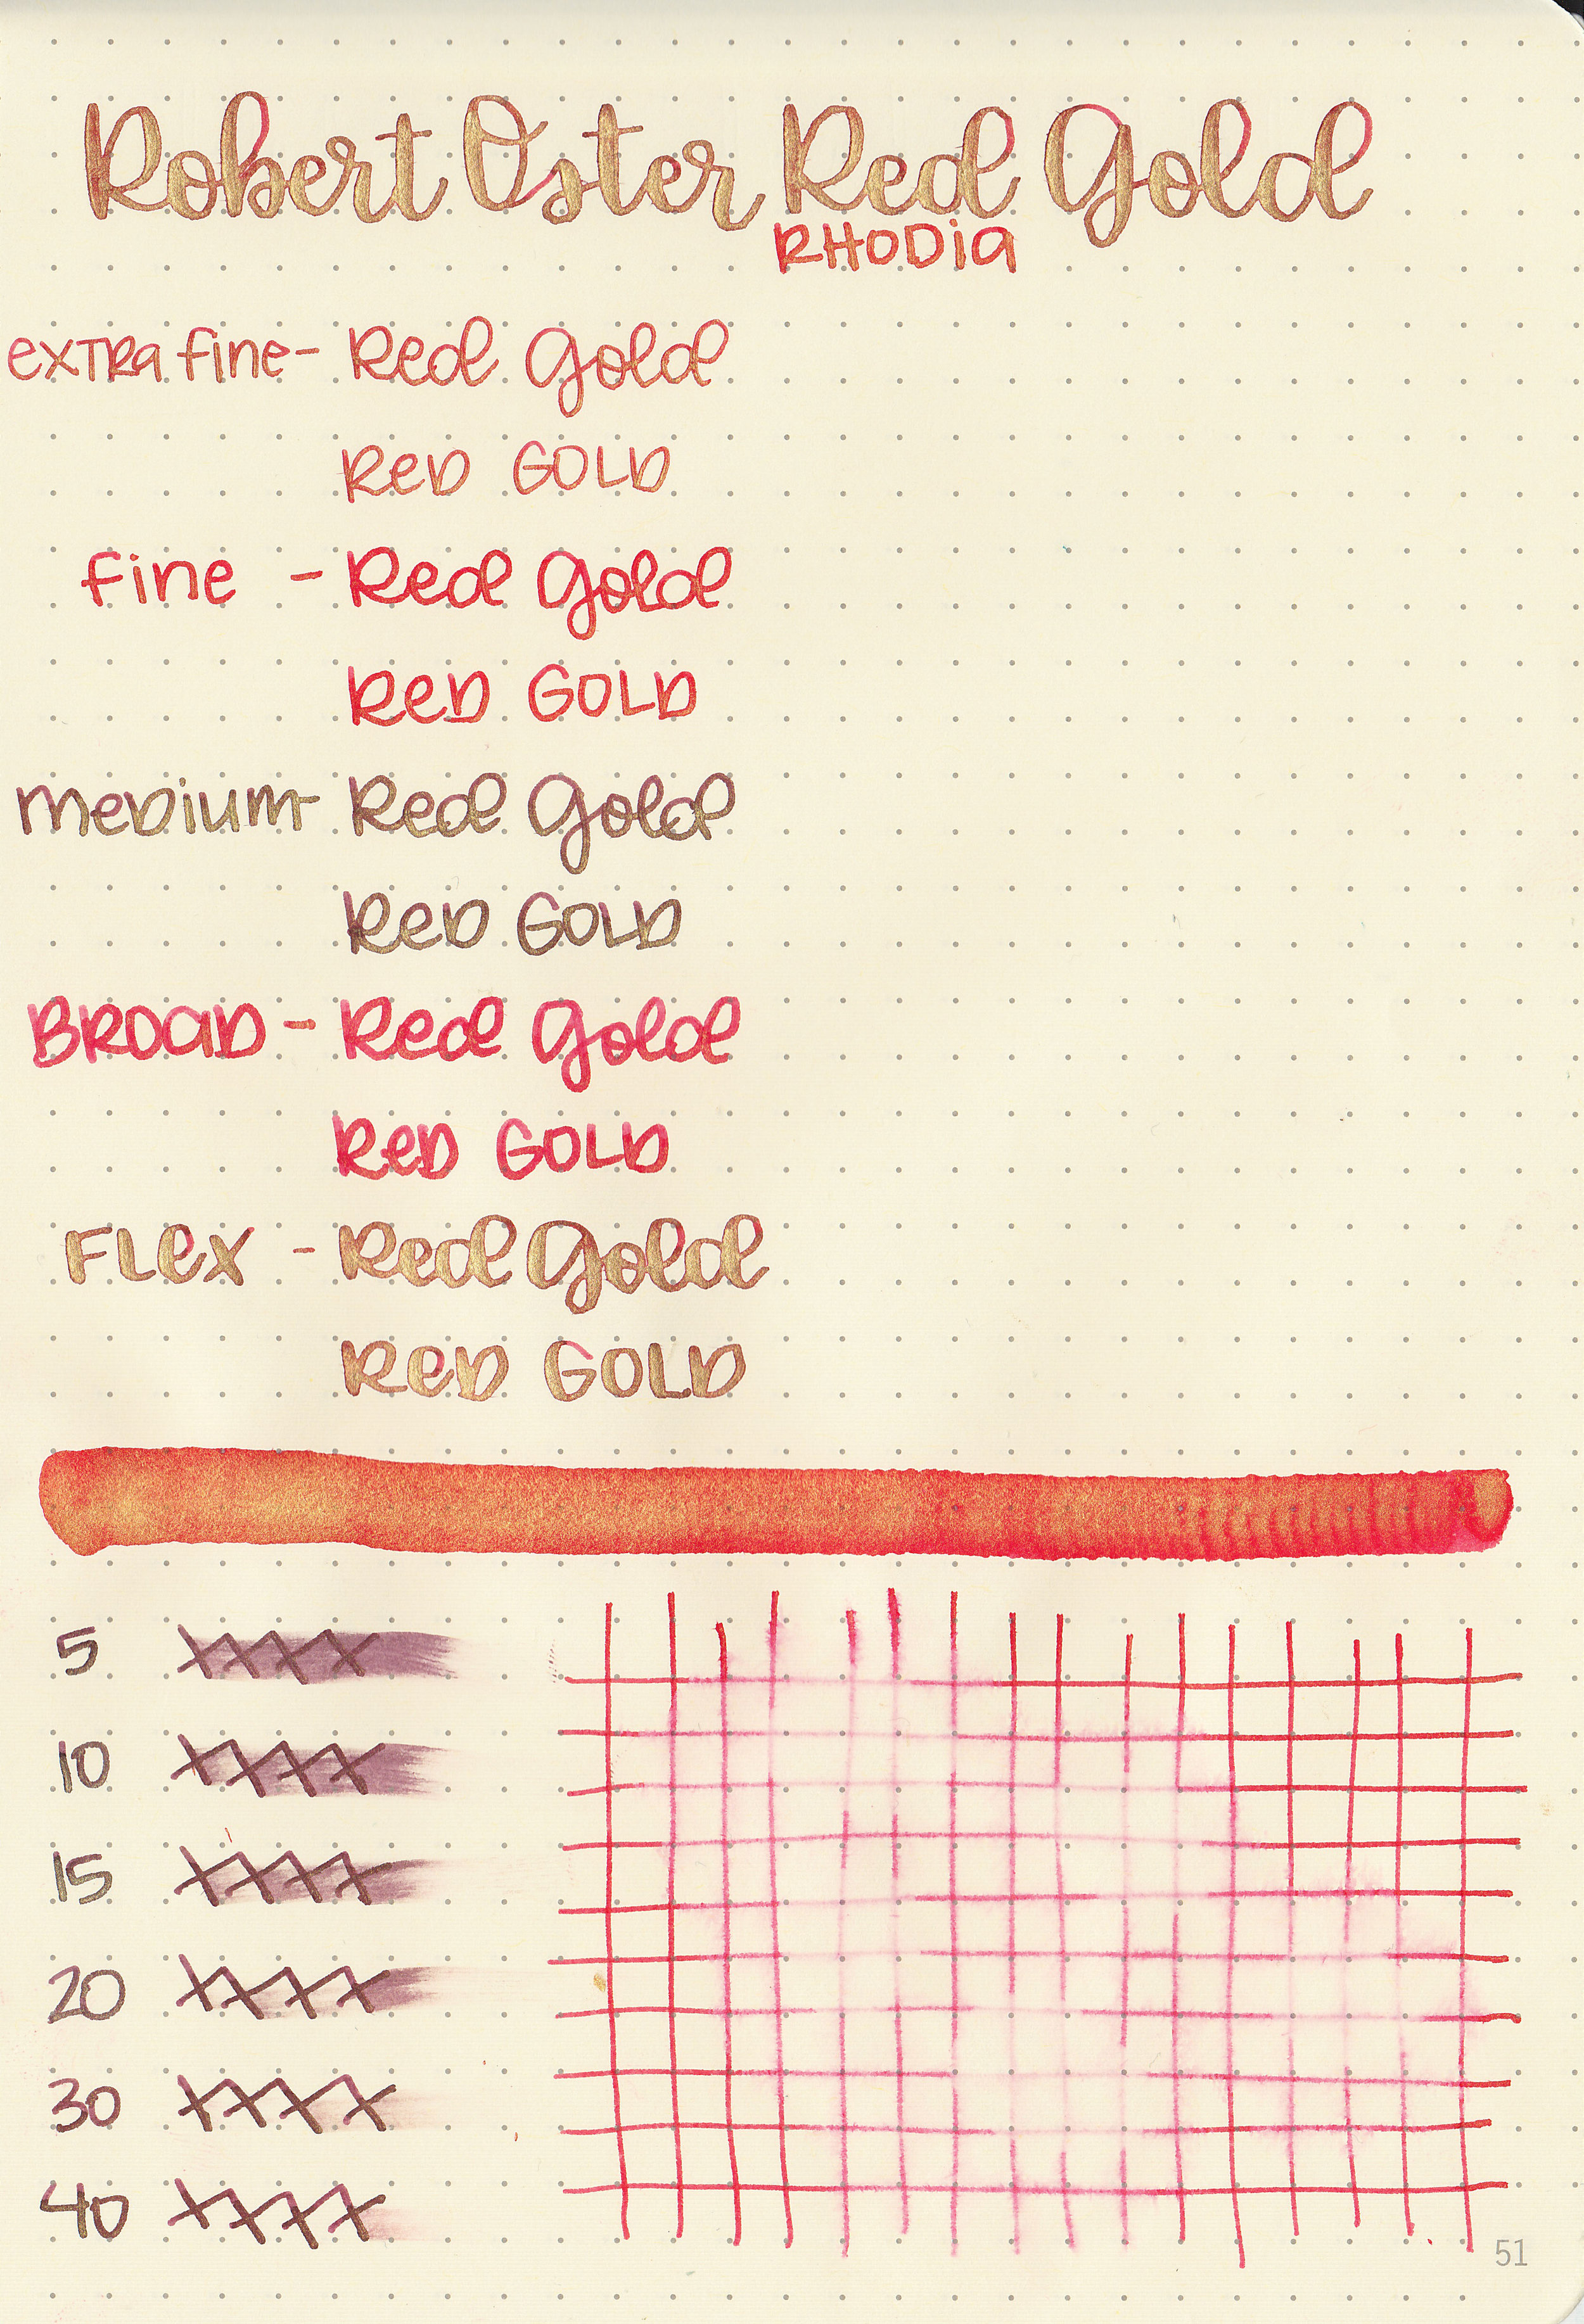 ro-red-gold-6.jpg